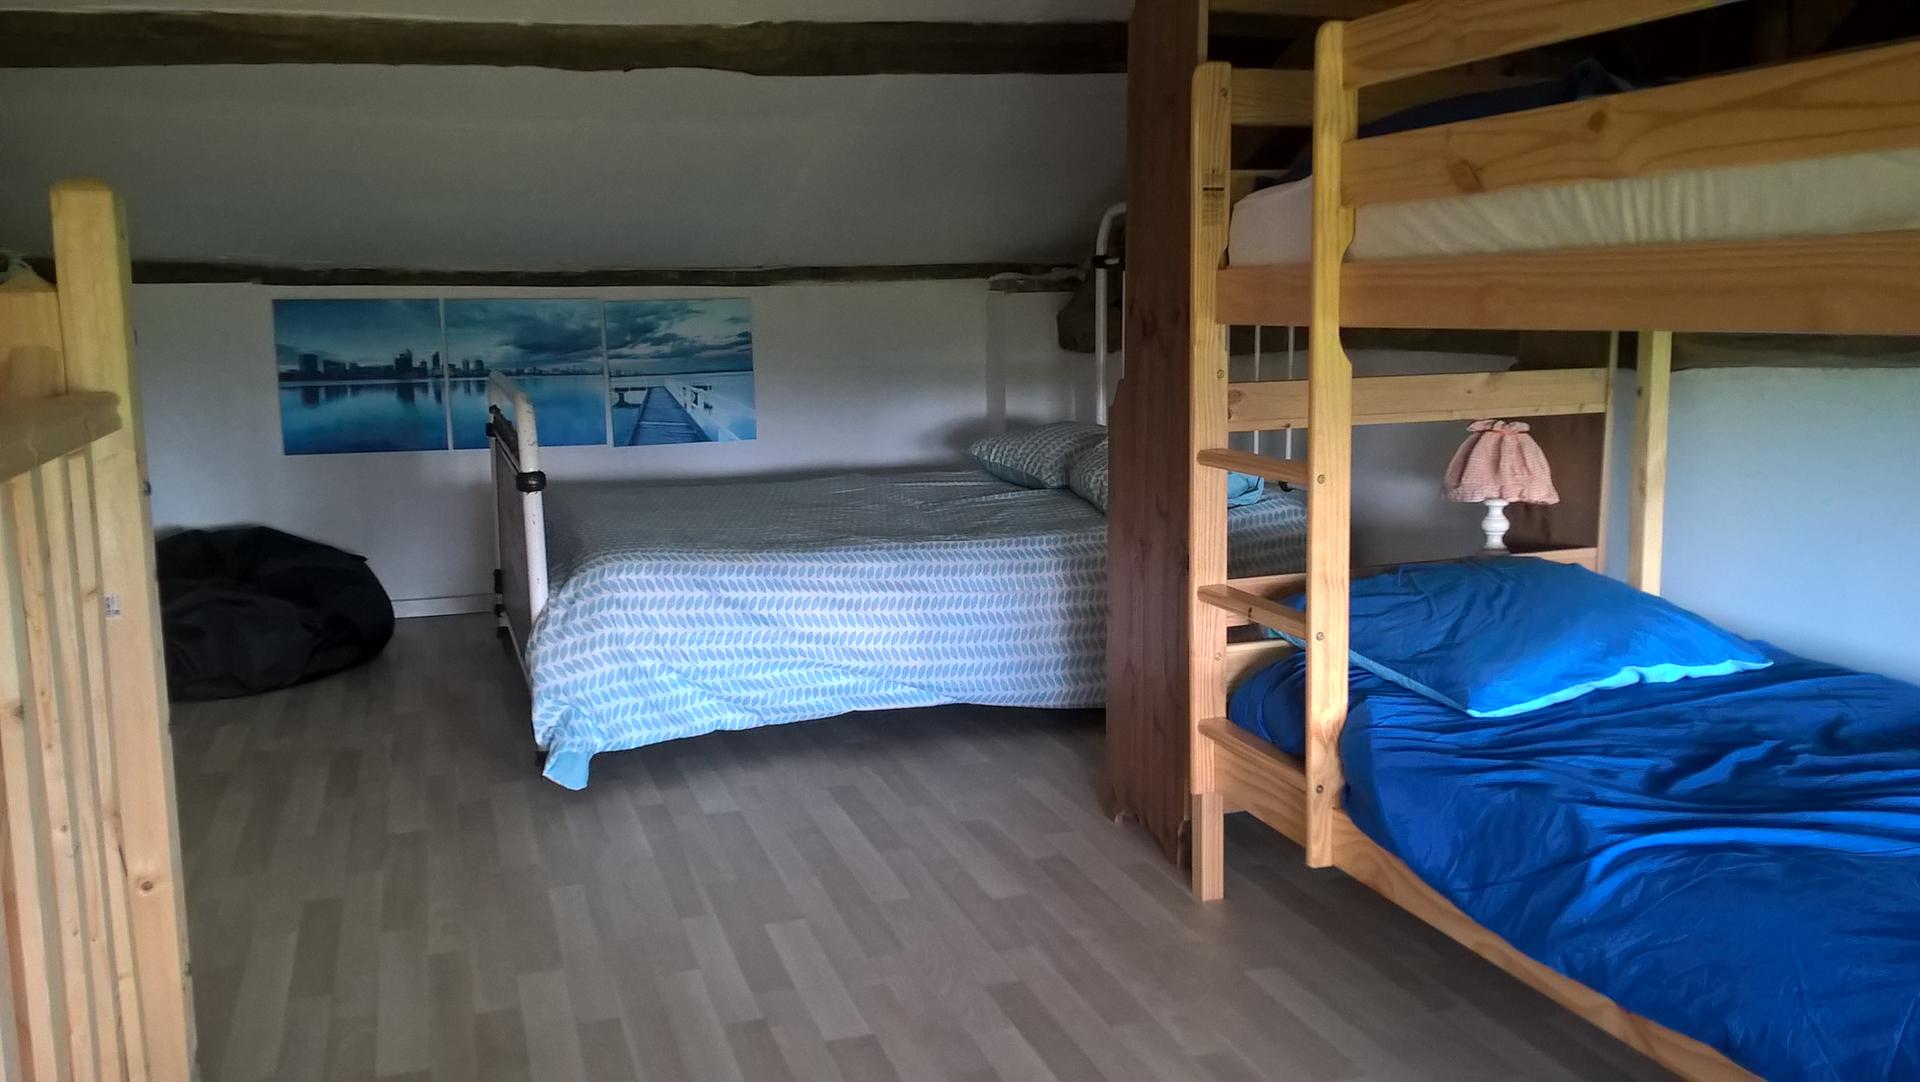 Ombrassa chambre étage avec lit superposés